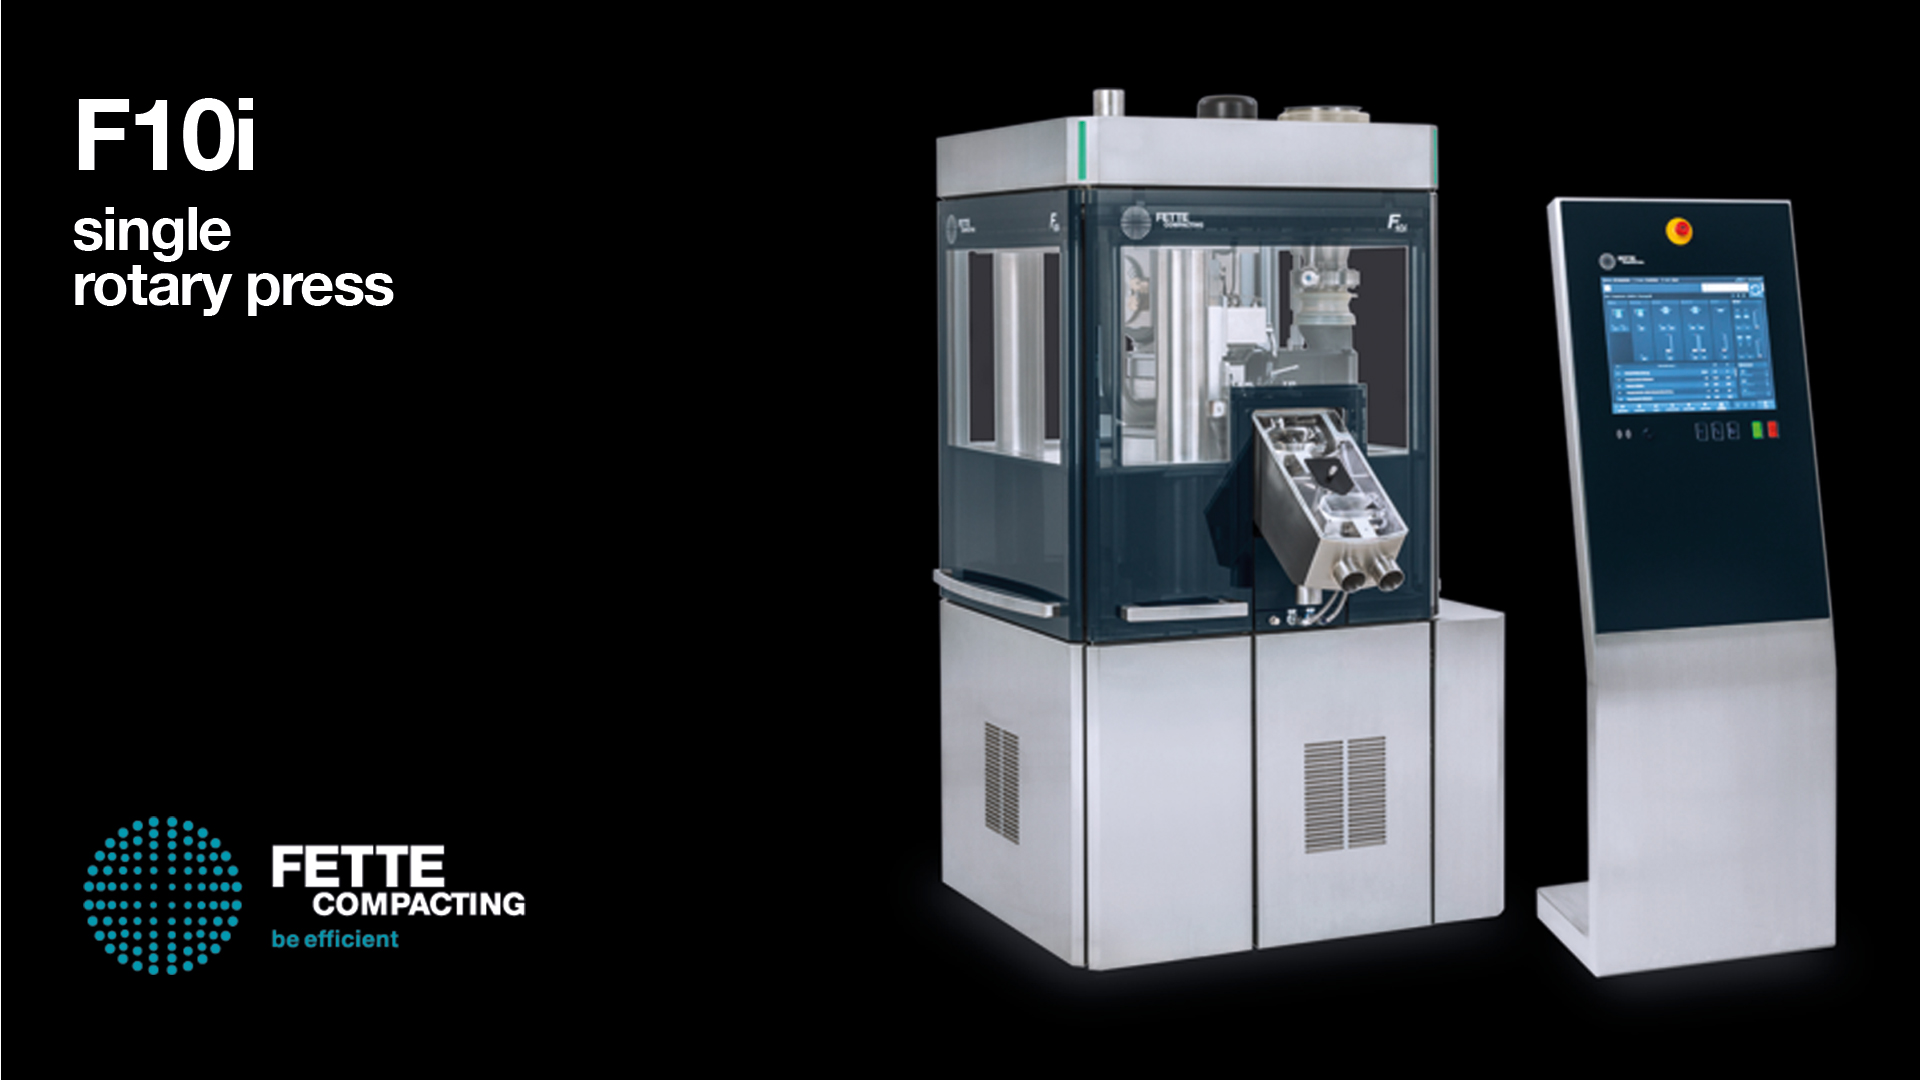 F10i comprimitrice fette compacting